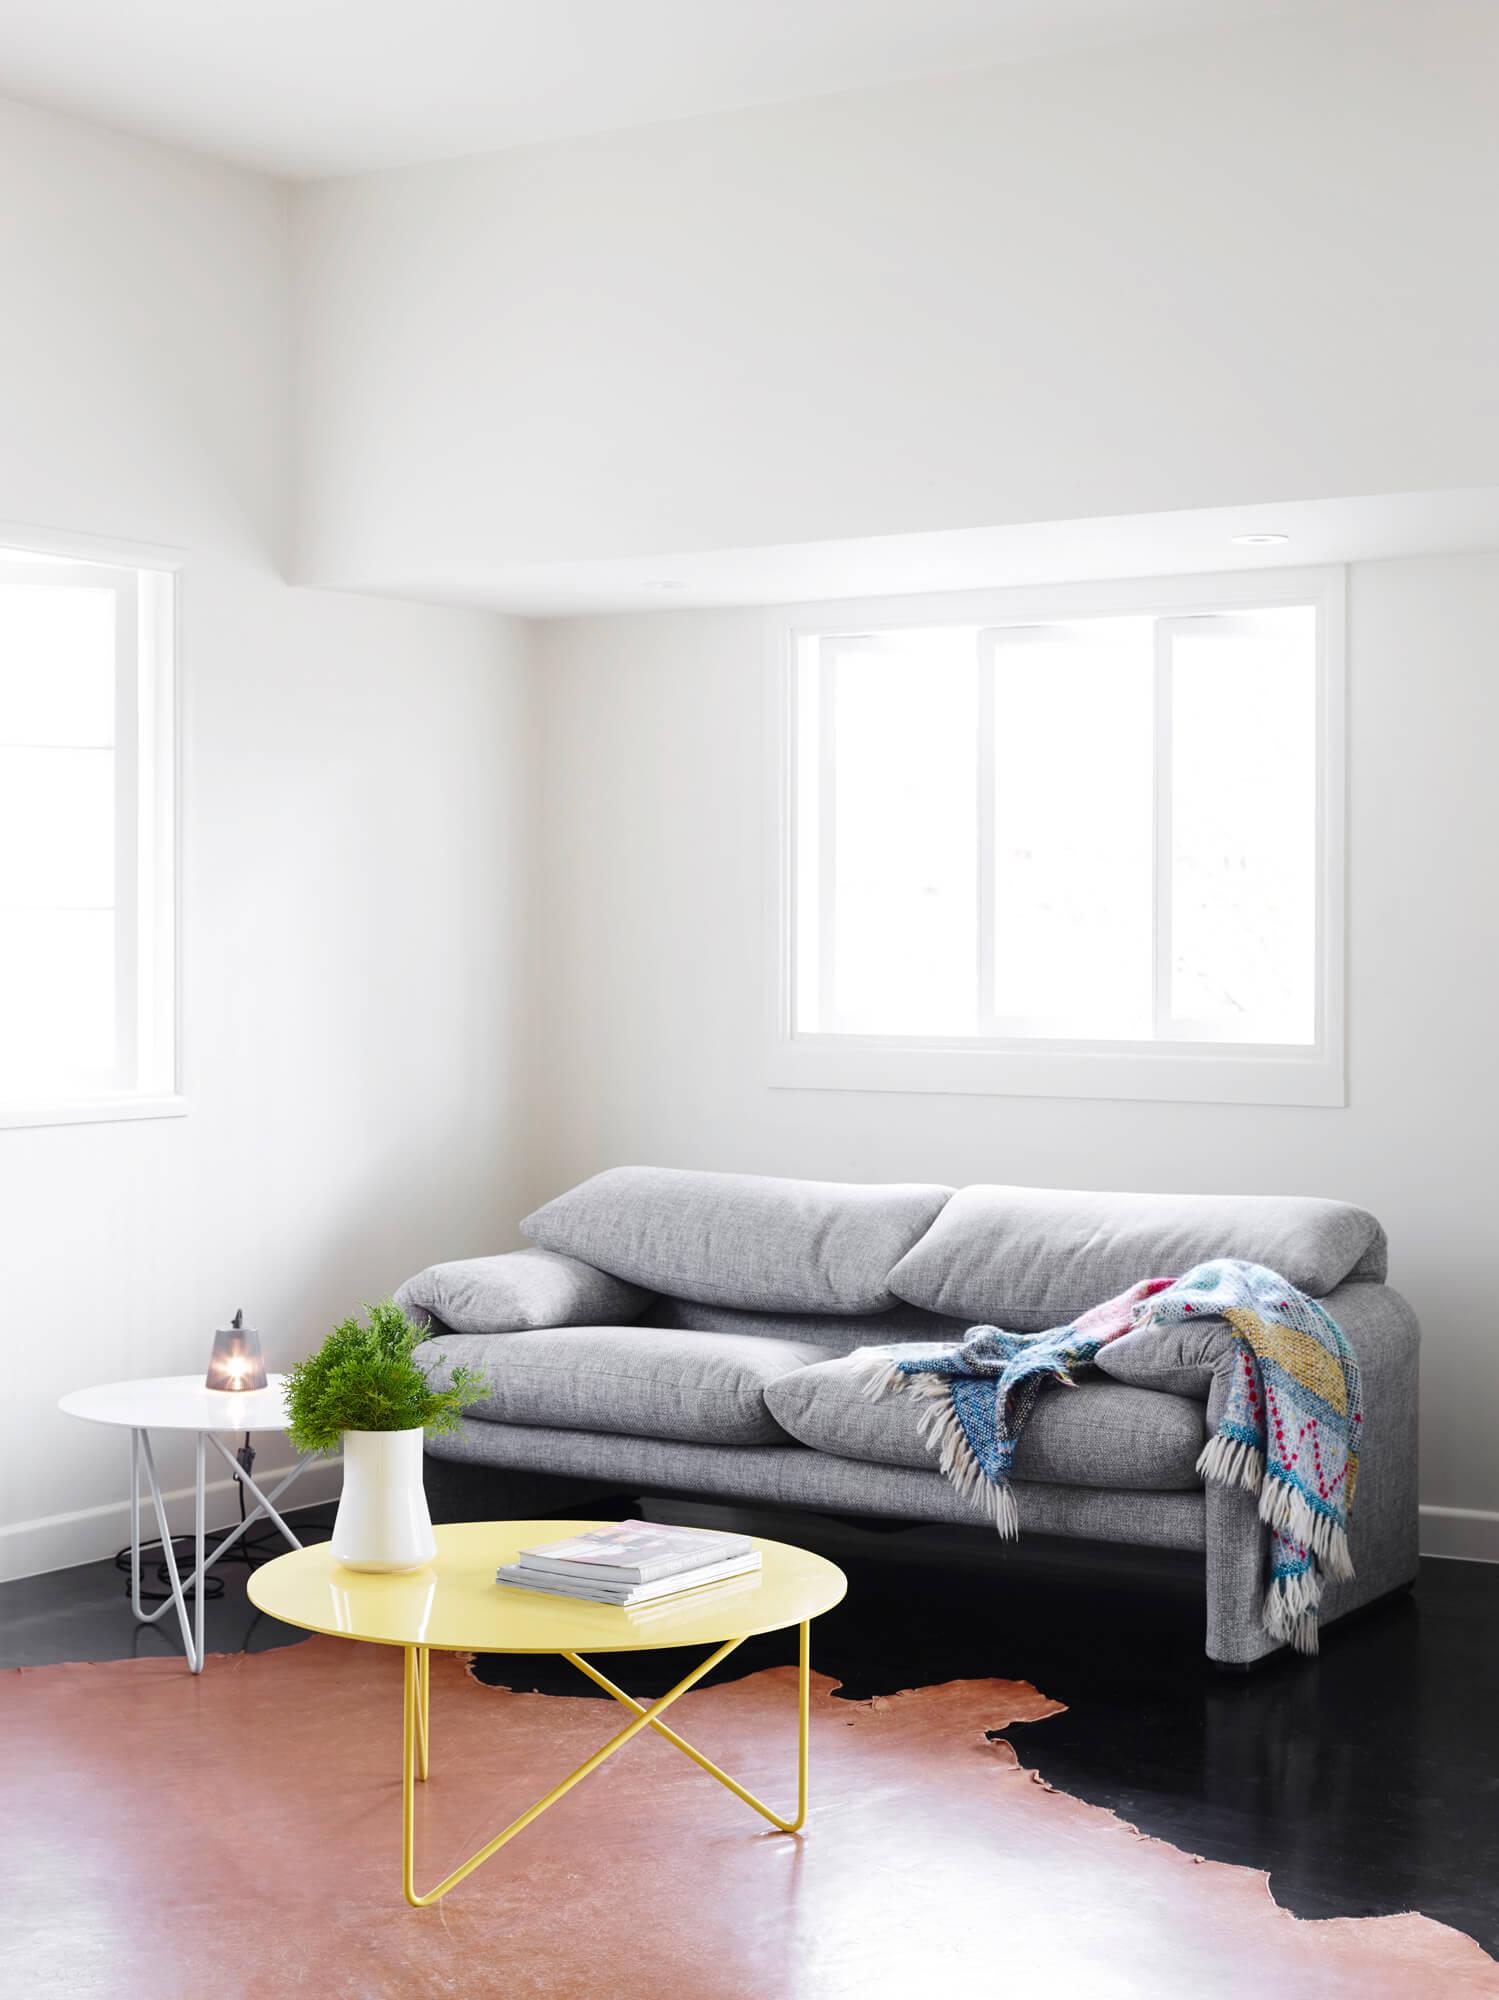 georgia-cannon-interior-designer-brisbane-project-m2-house-017075.jpg